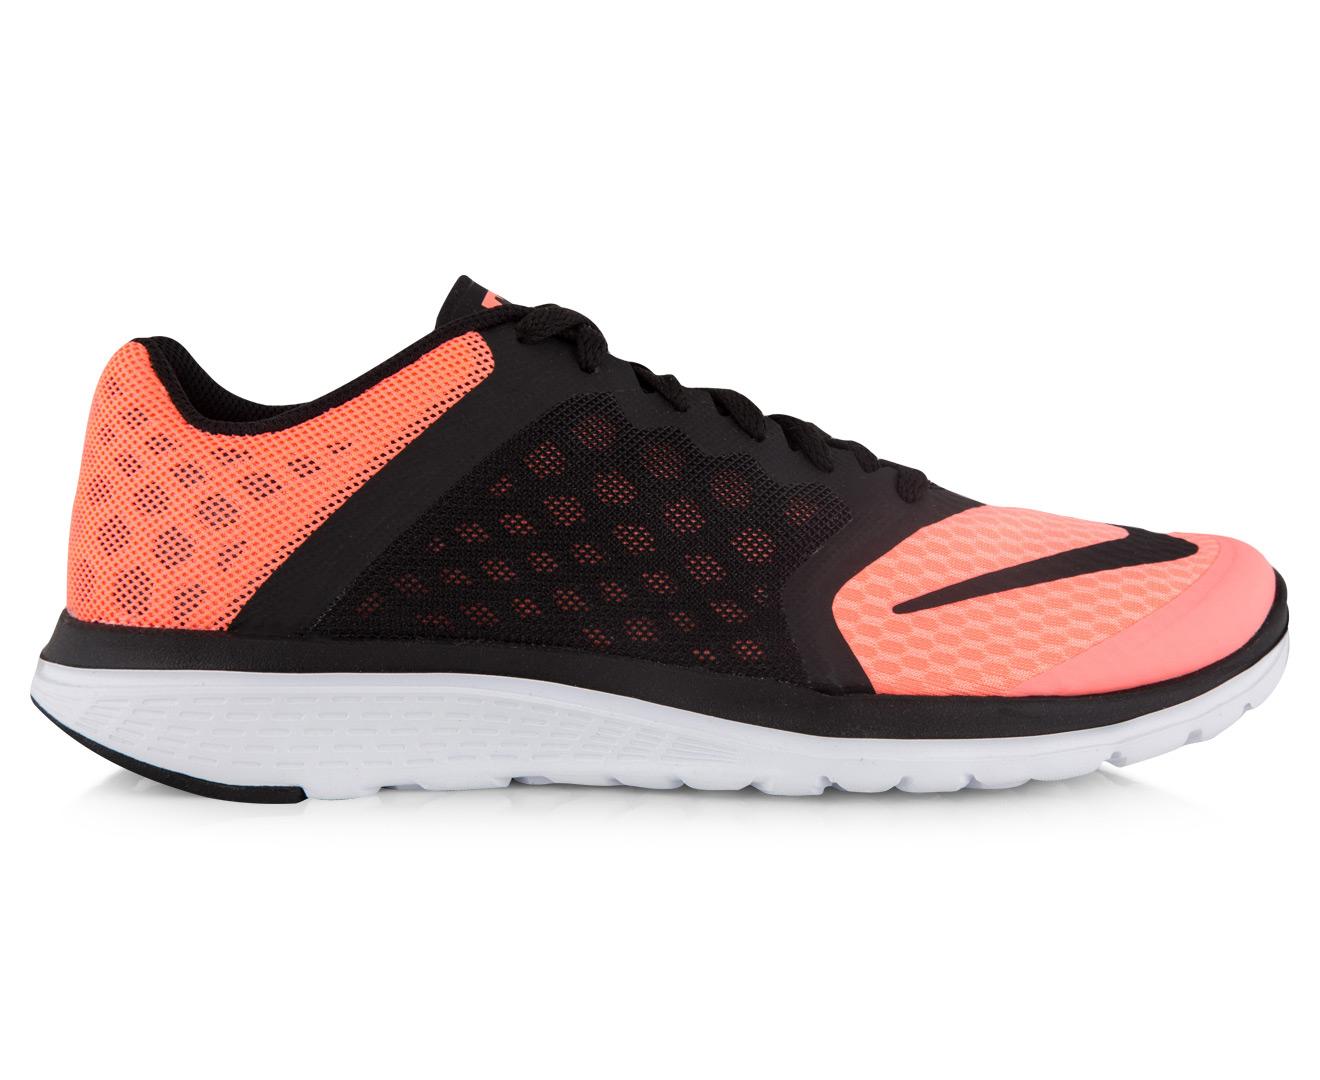 22ba8549ce2 Nike Women s FS Lite Run 3 Shoe - Lava Black White